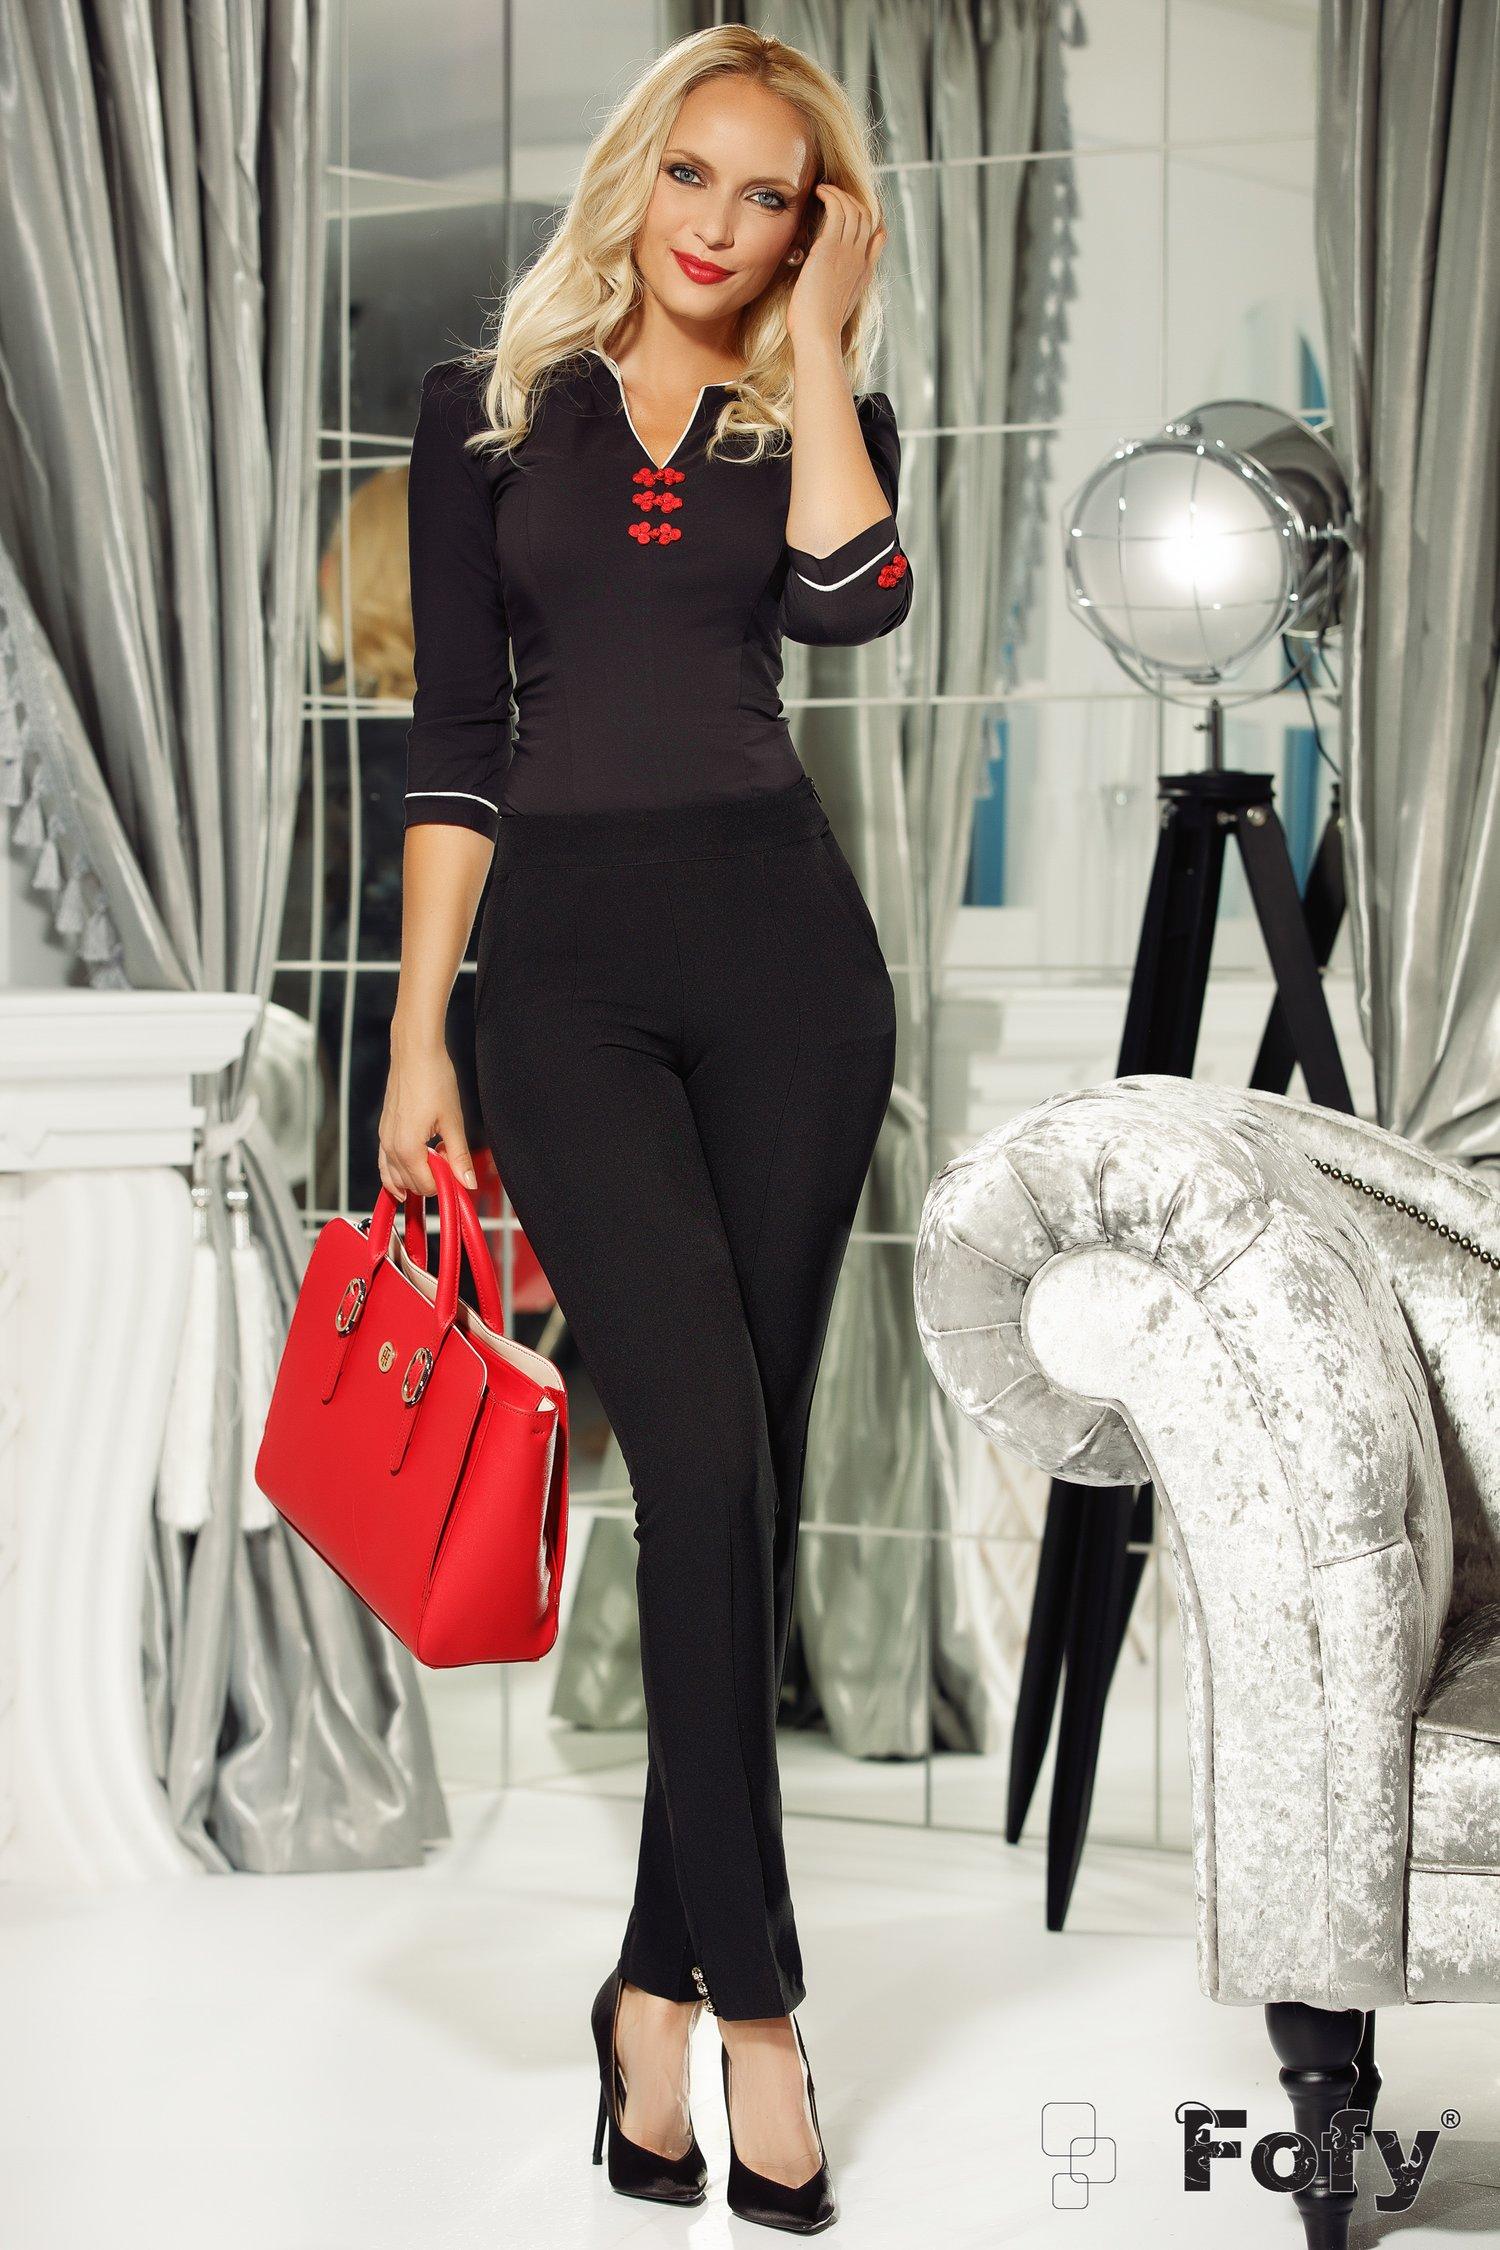 Bluza Fofy neagra cu aplicatii rosii 3D